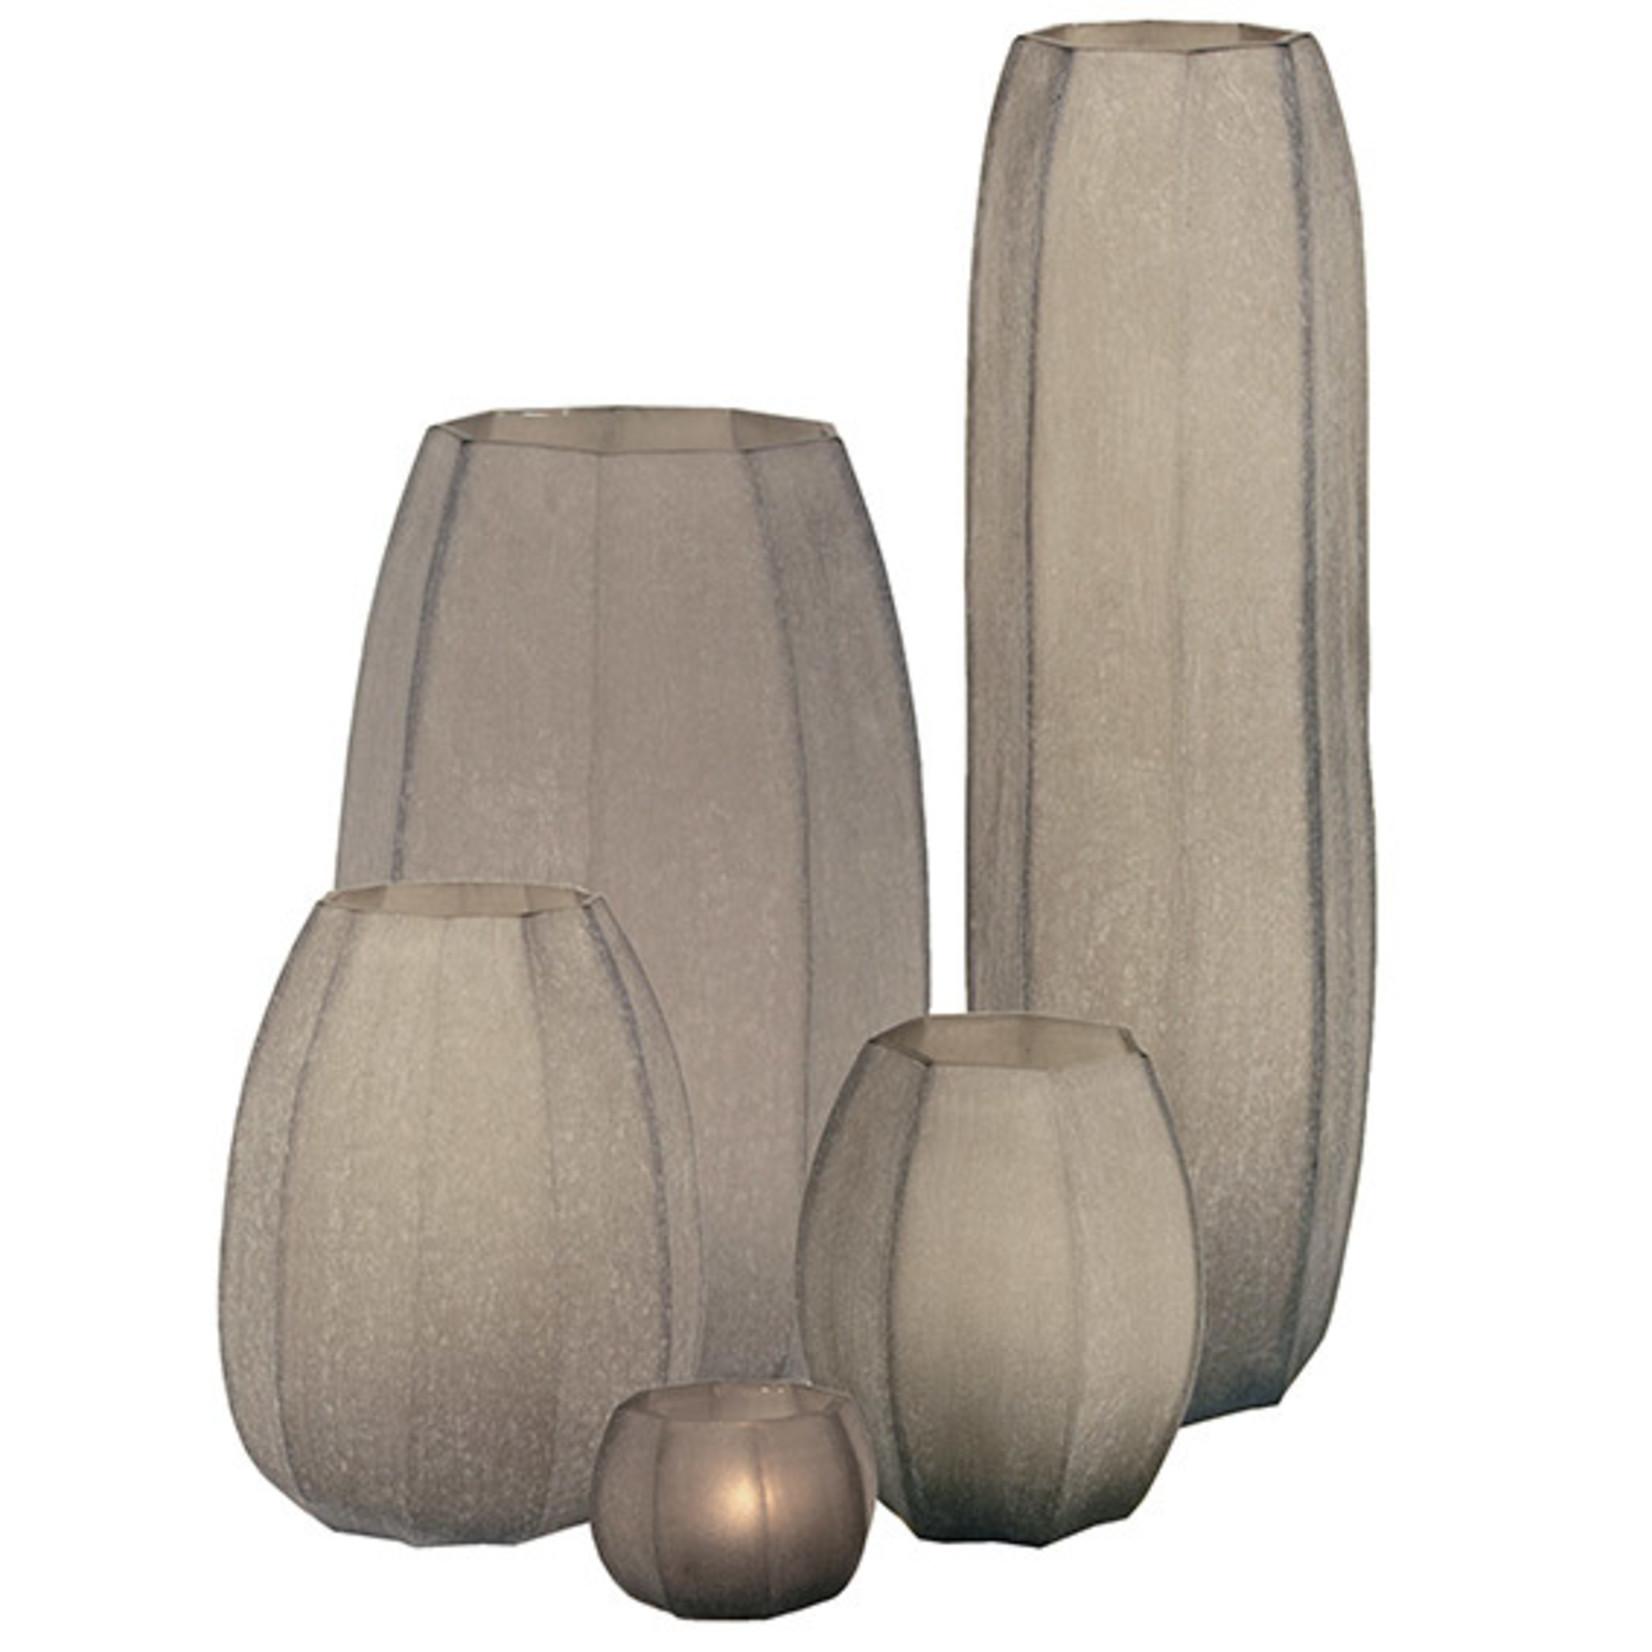 Guaxs Vase Koonam Tall   smoke grey